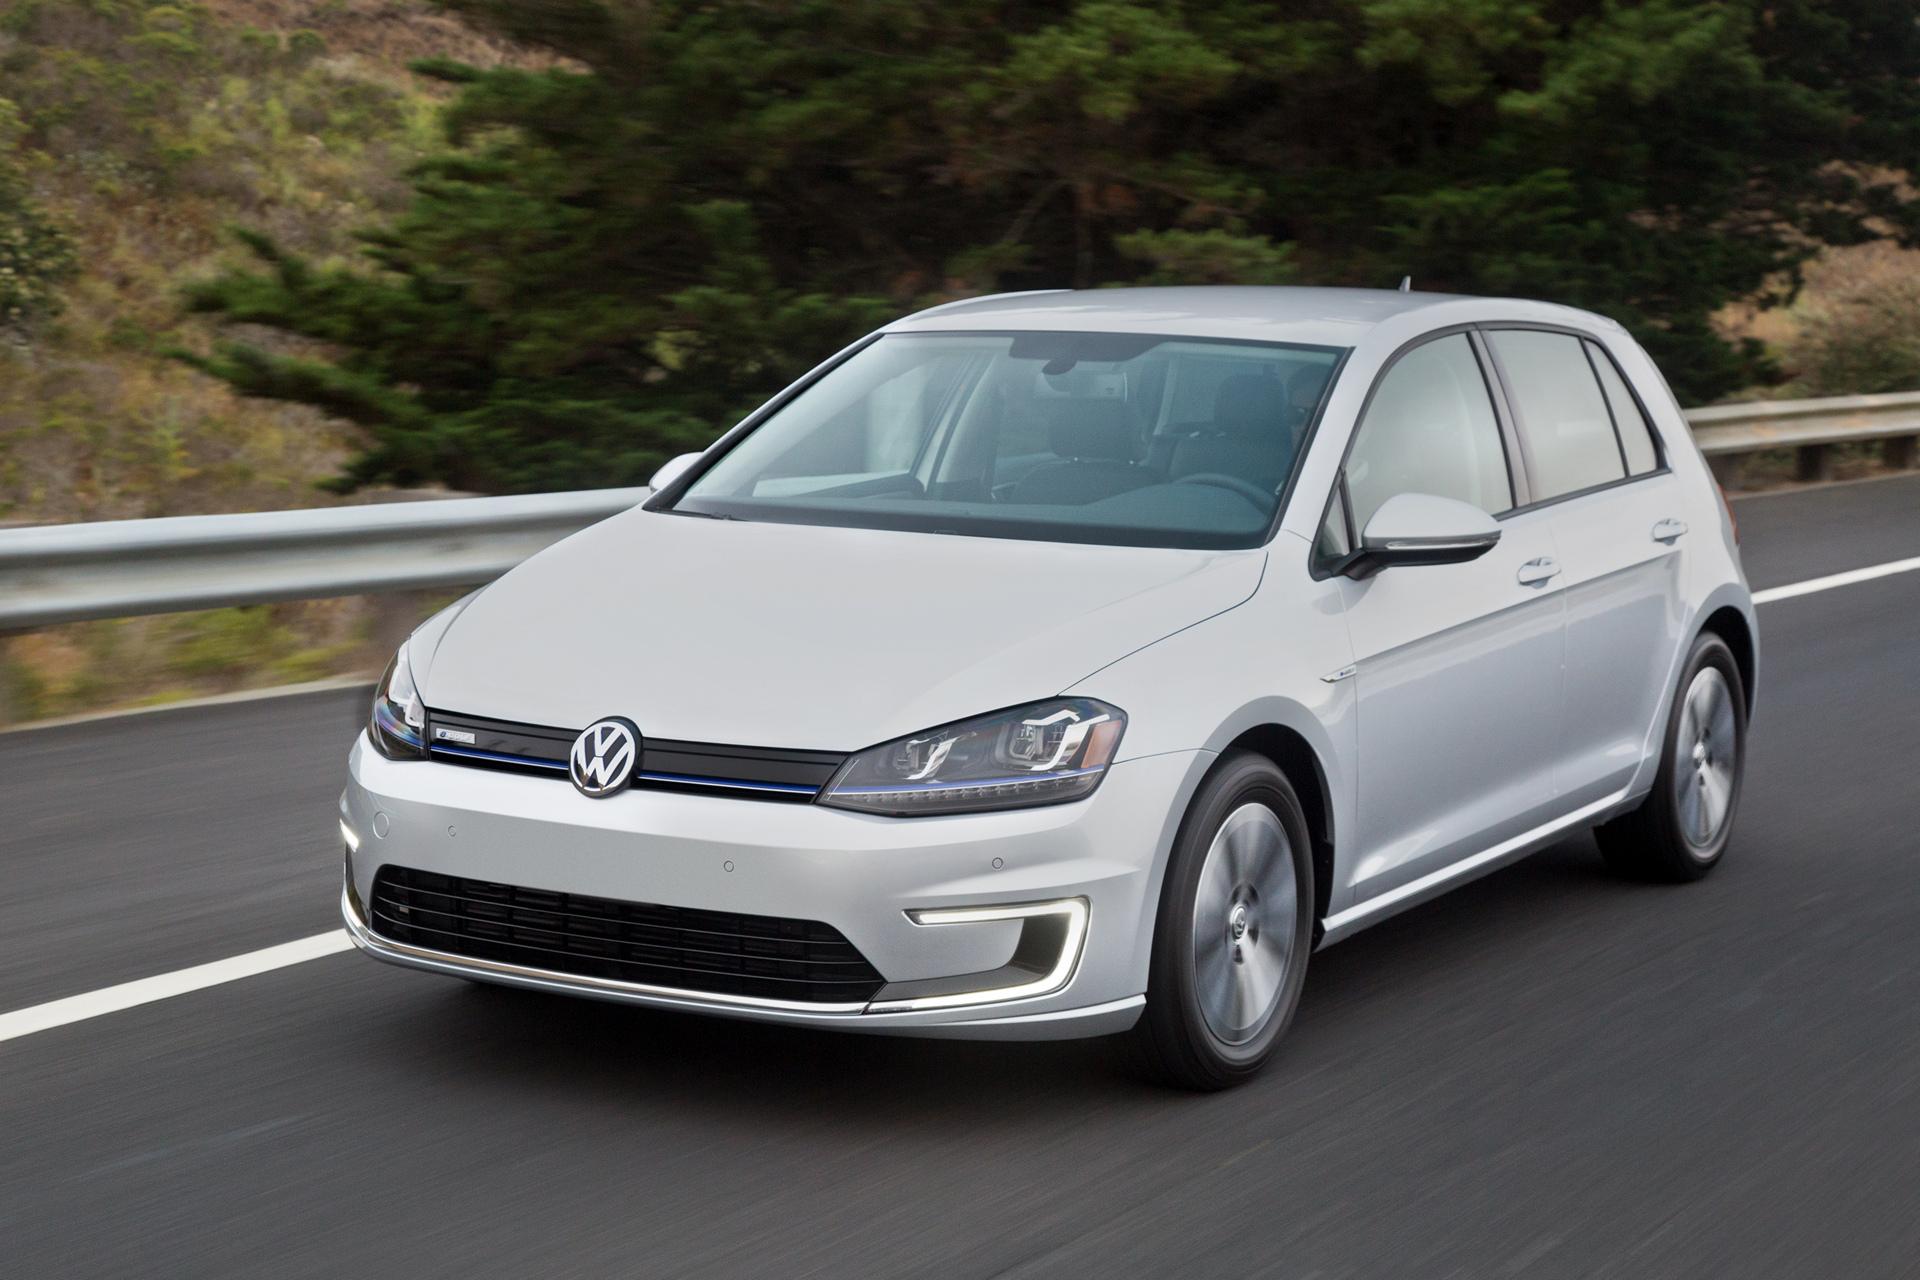 2016 Volkswagen e-Golf © Volkswagen AG